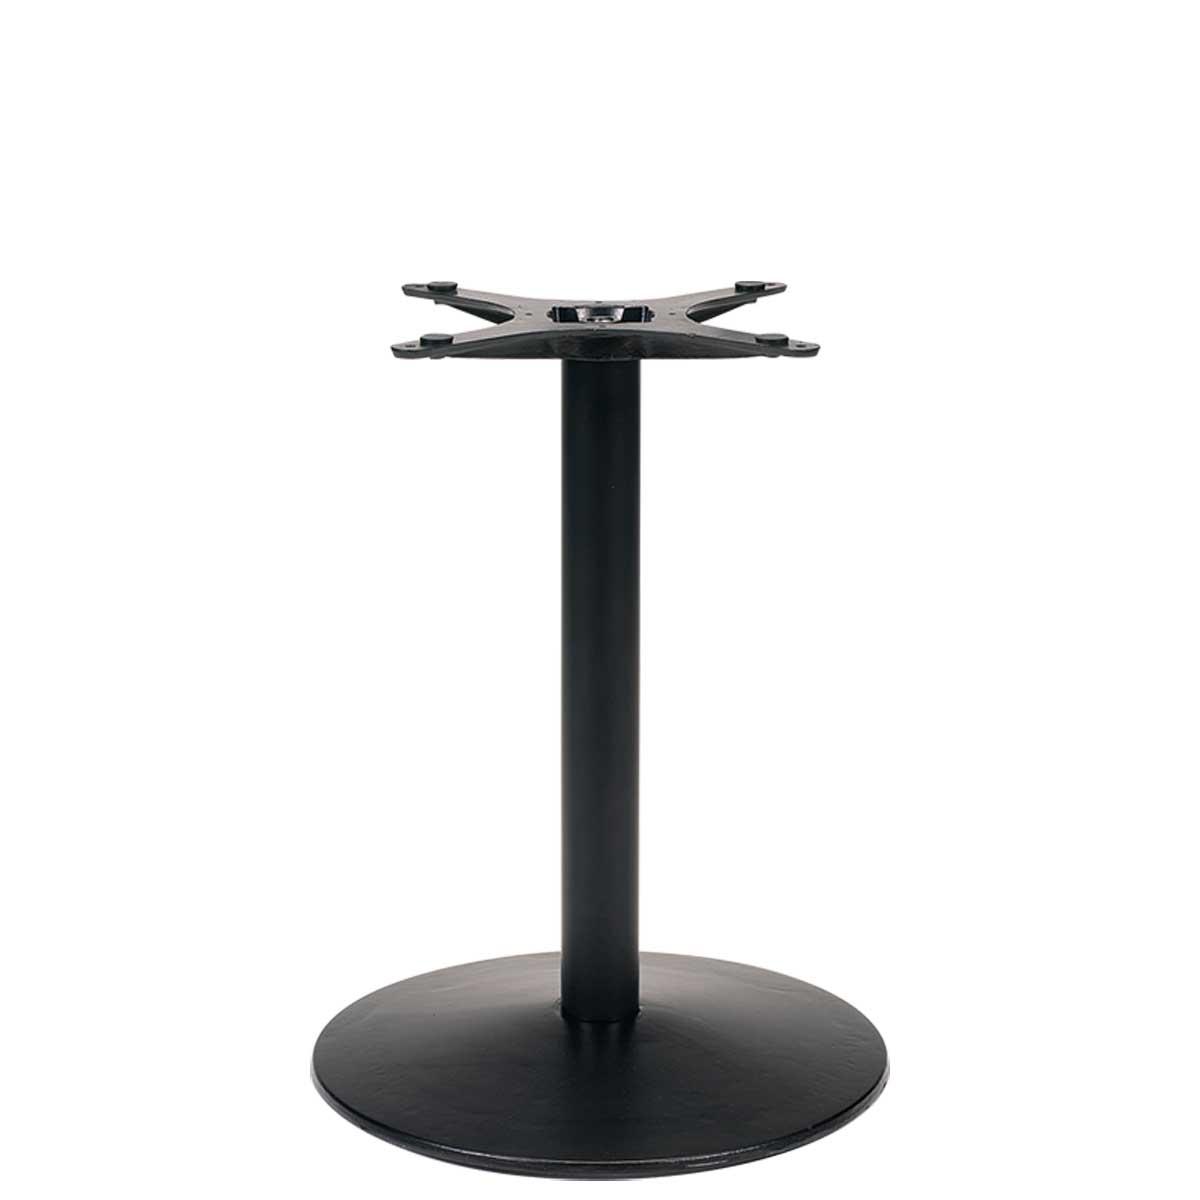 ronda55 noir - https://www.werzalit.com/en/product/ronda-55/